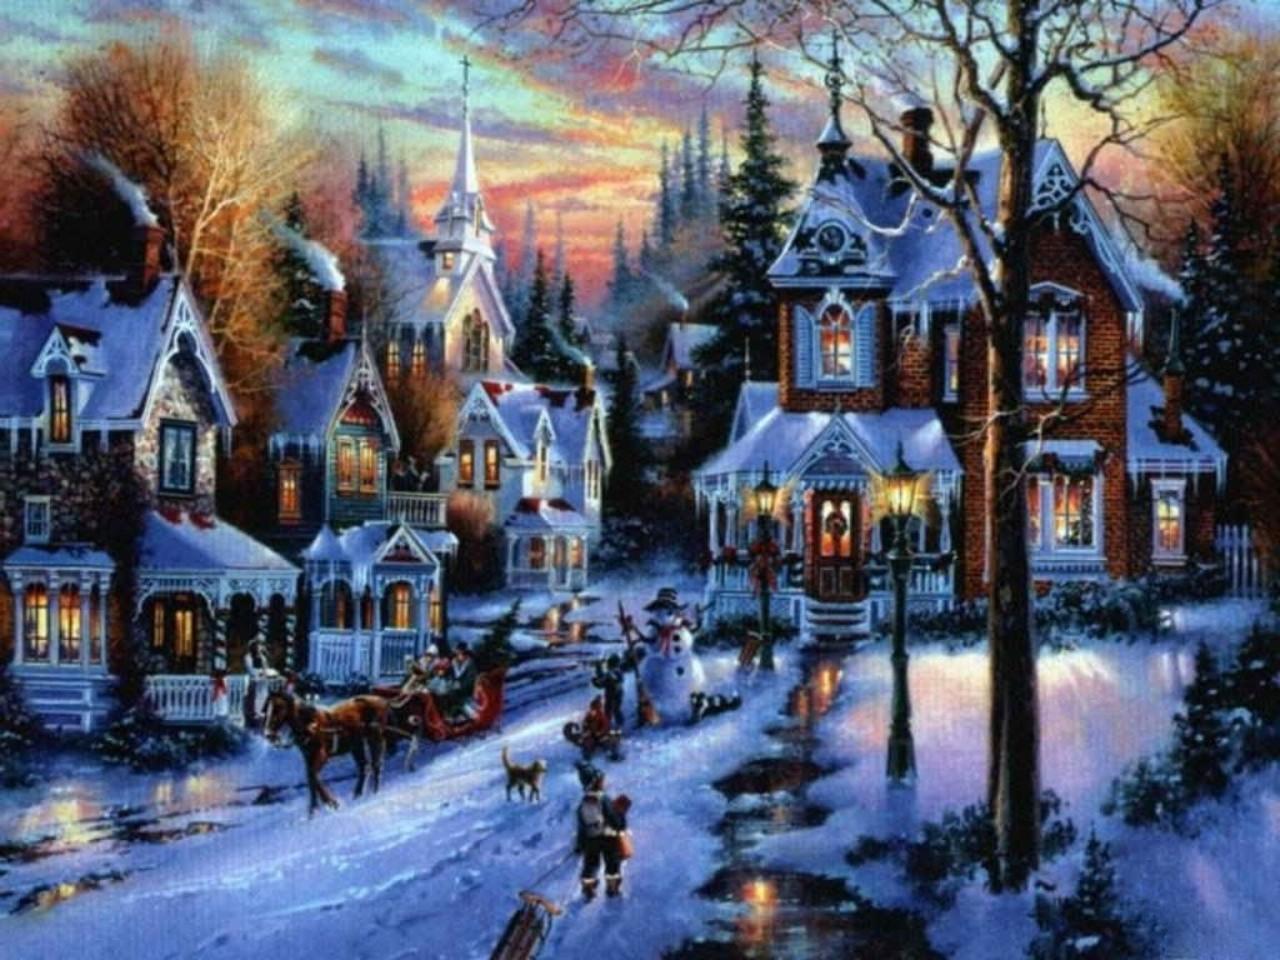 Snowy village wallpaper wallpapersafari - Christmas village wallpaper widescreen ...